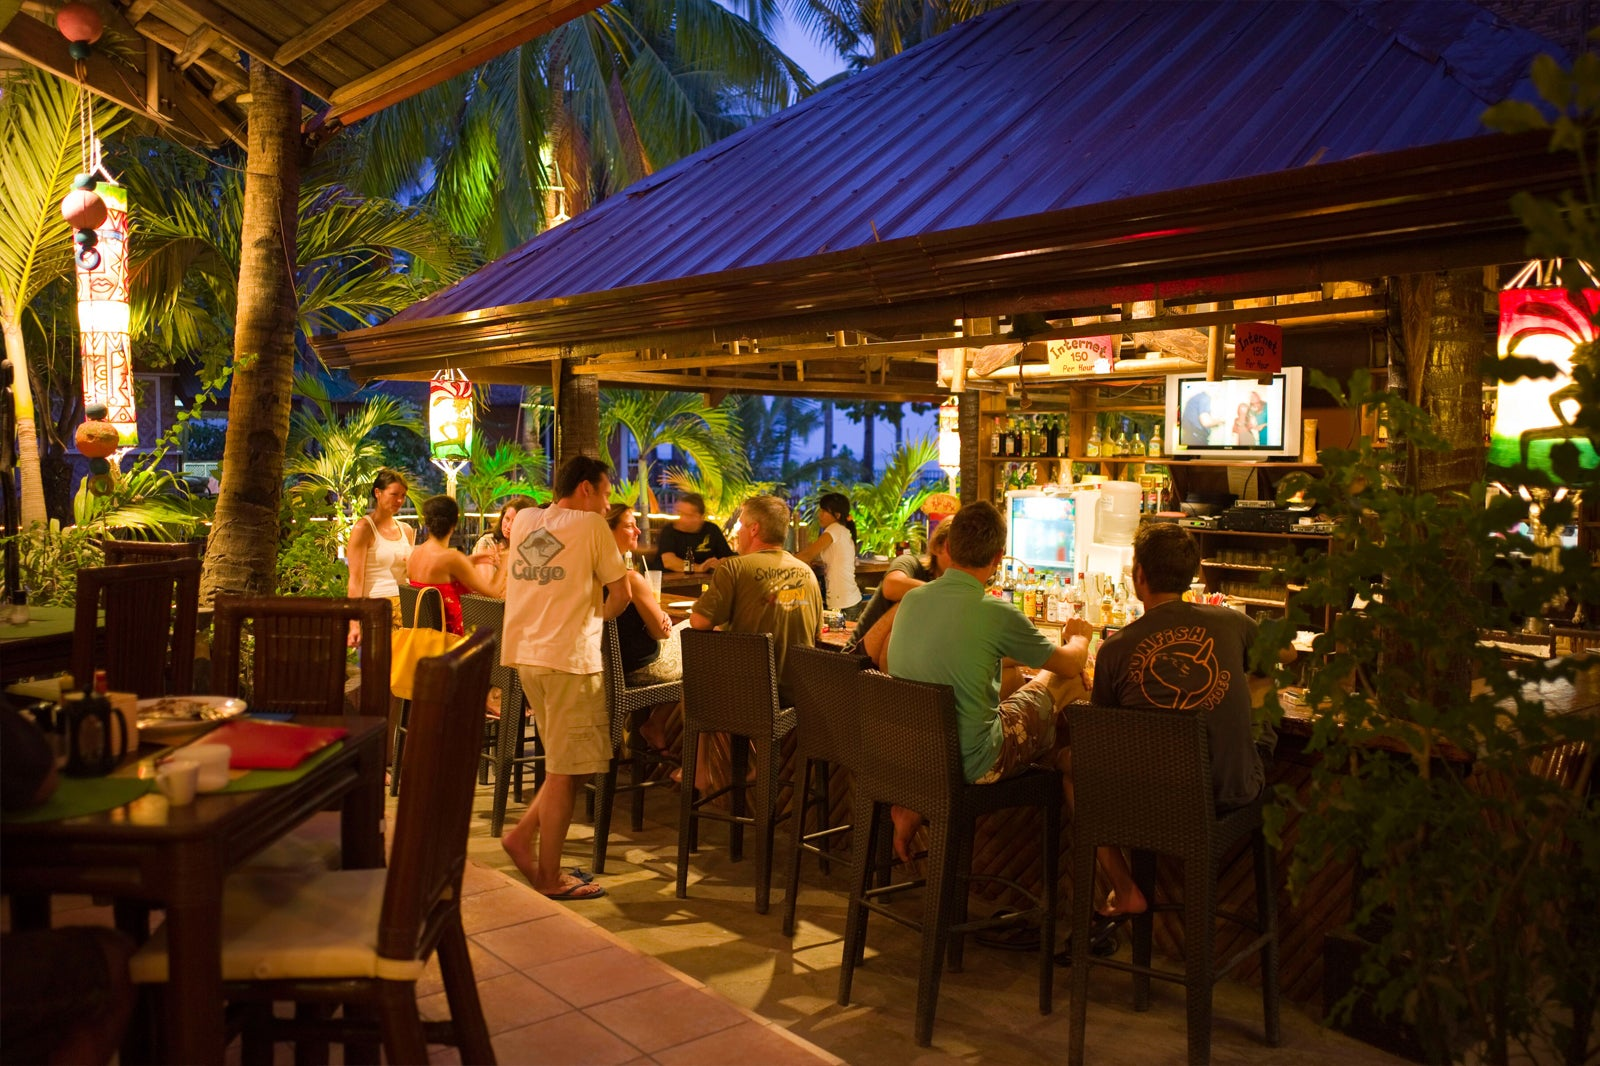 11 Best Nightlife Experiences in Cebu - Where to Go in ...